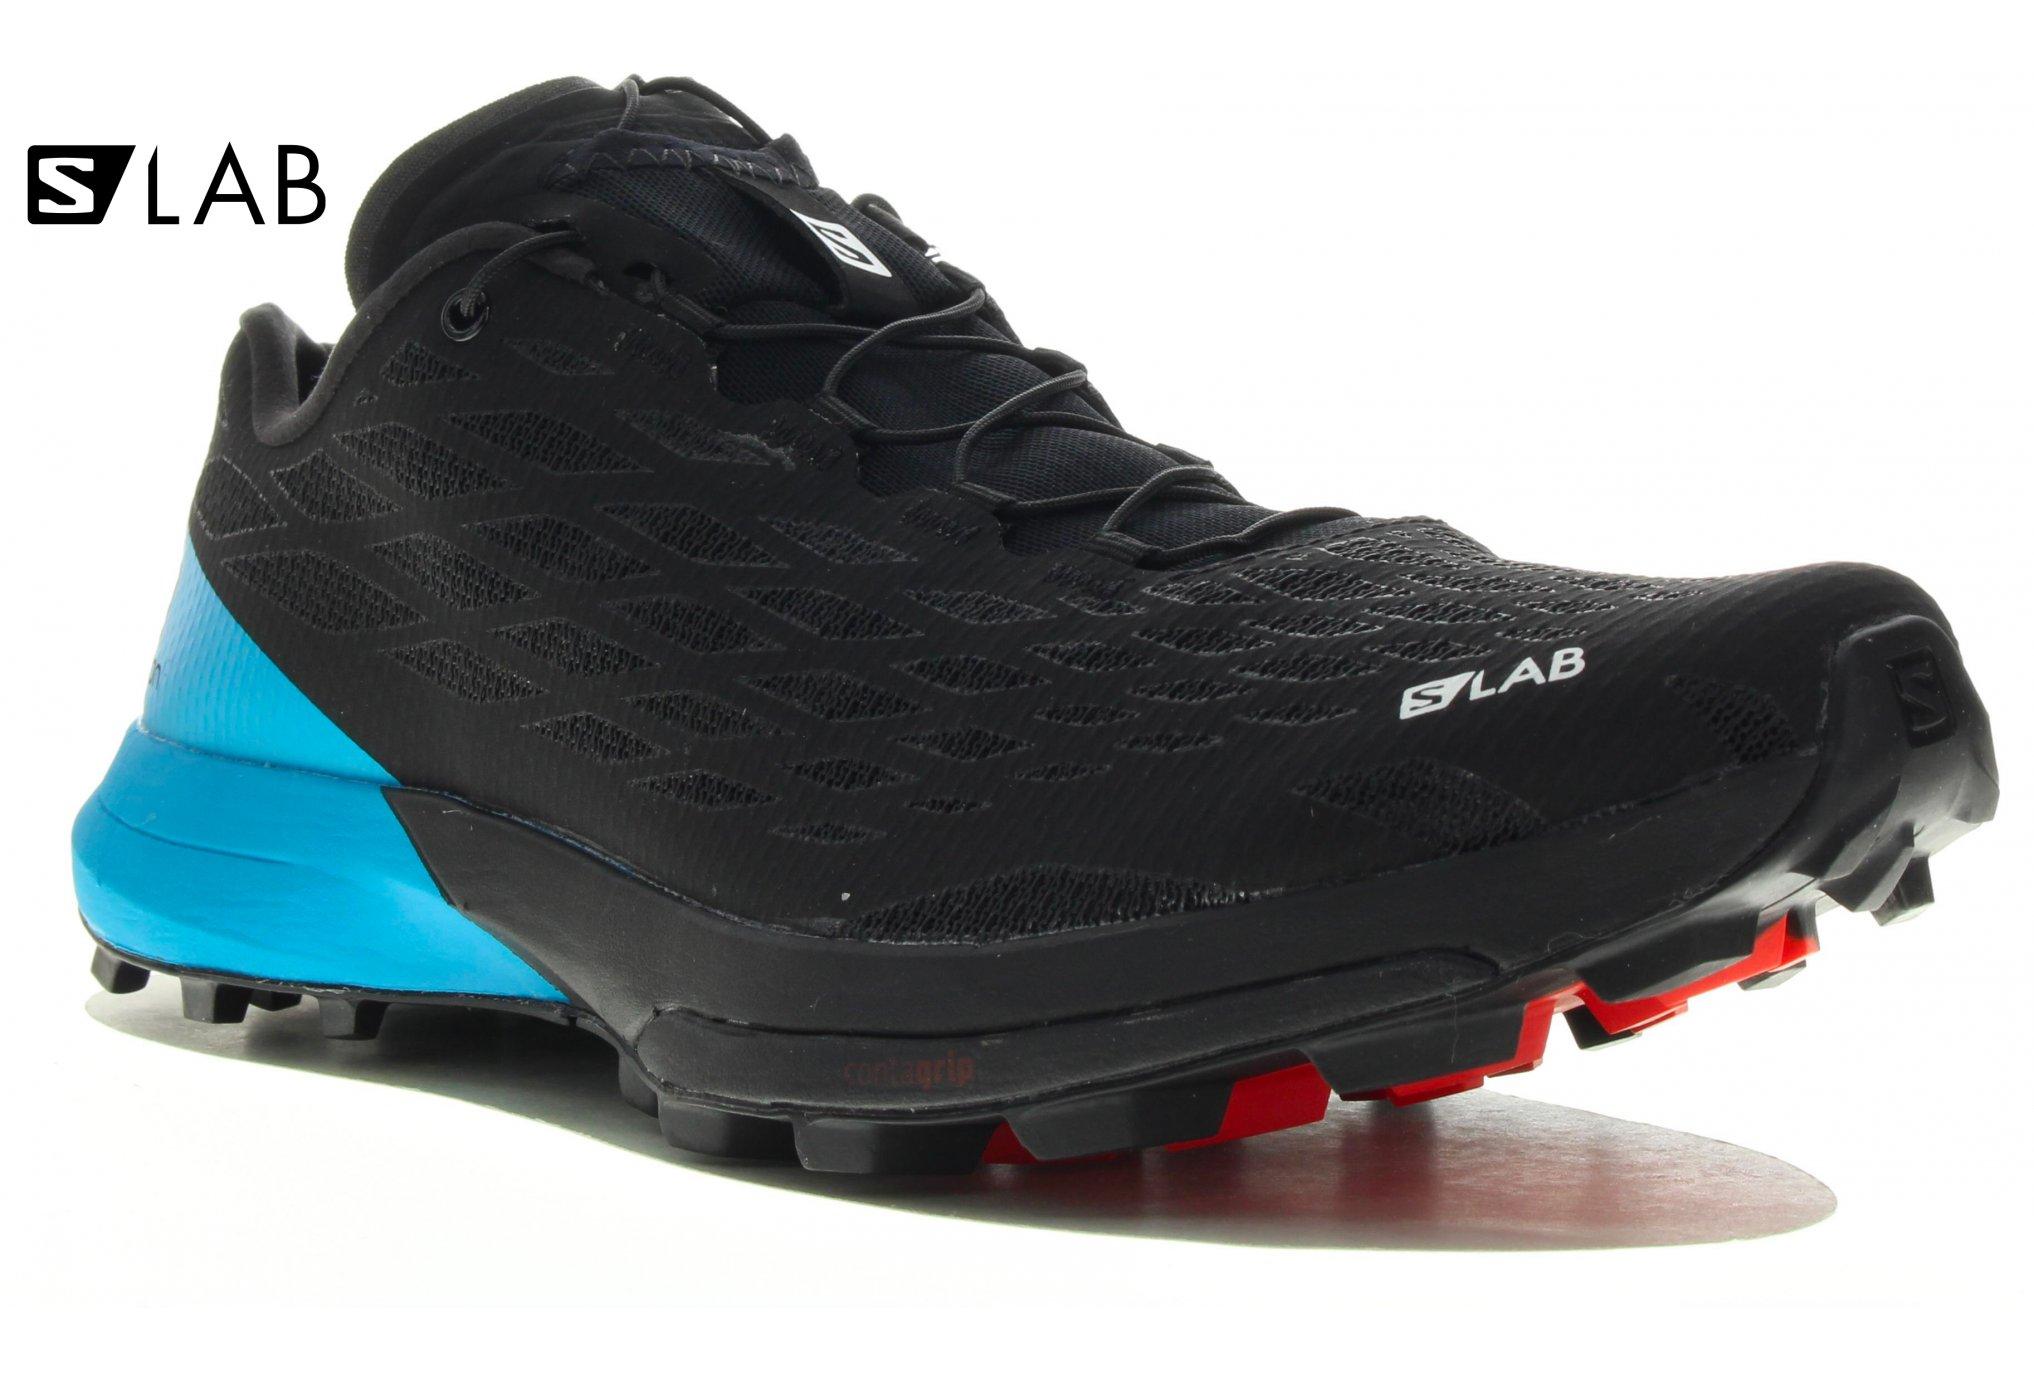 Salomon Salomon S-Lab XA Amphib 2 Chaussures running femme